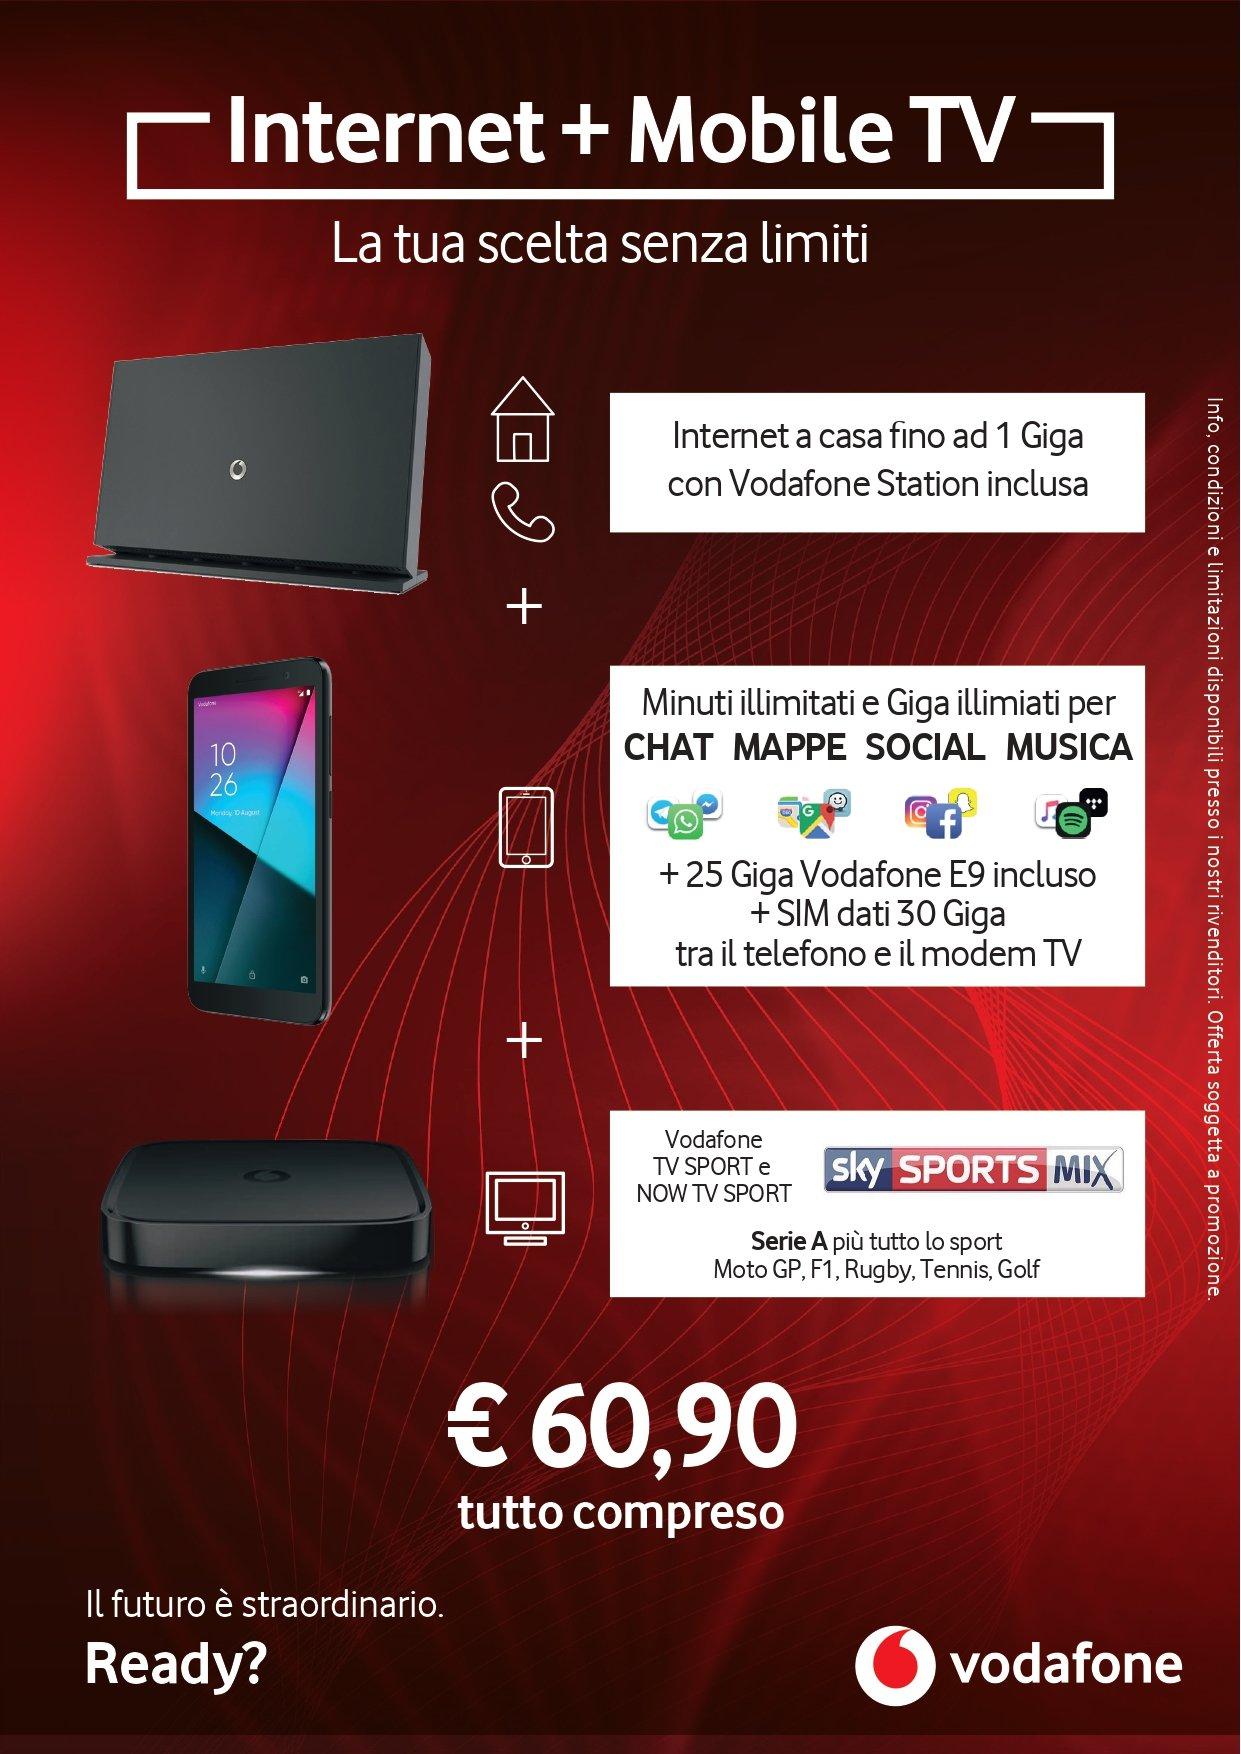 Fibra+smartphone+tv!estate Vodafone!